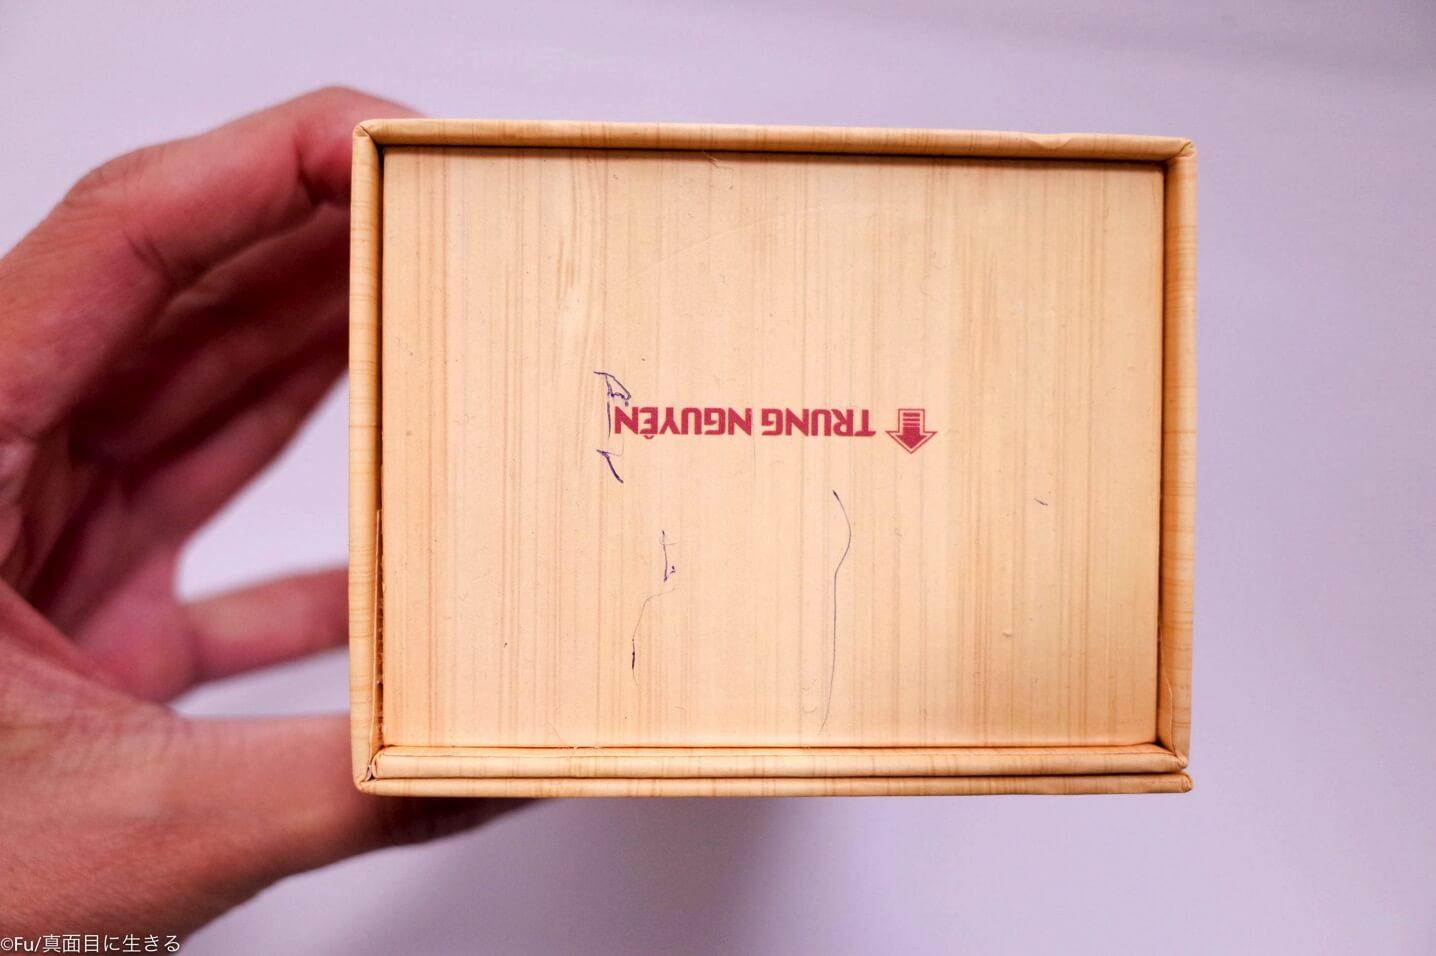 「Legendee」の箱裏